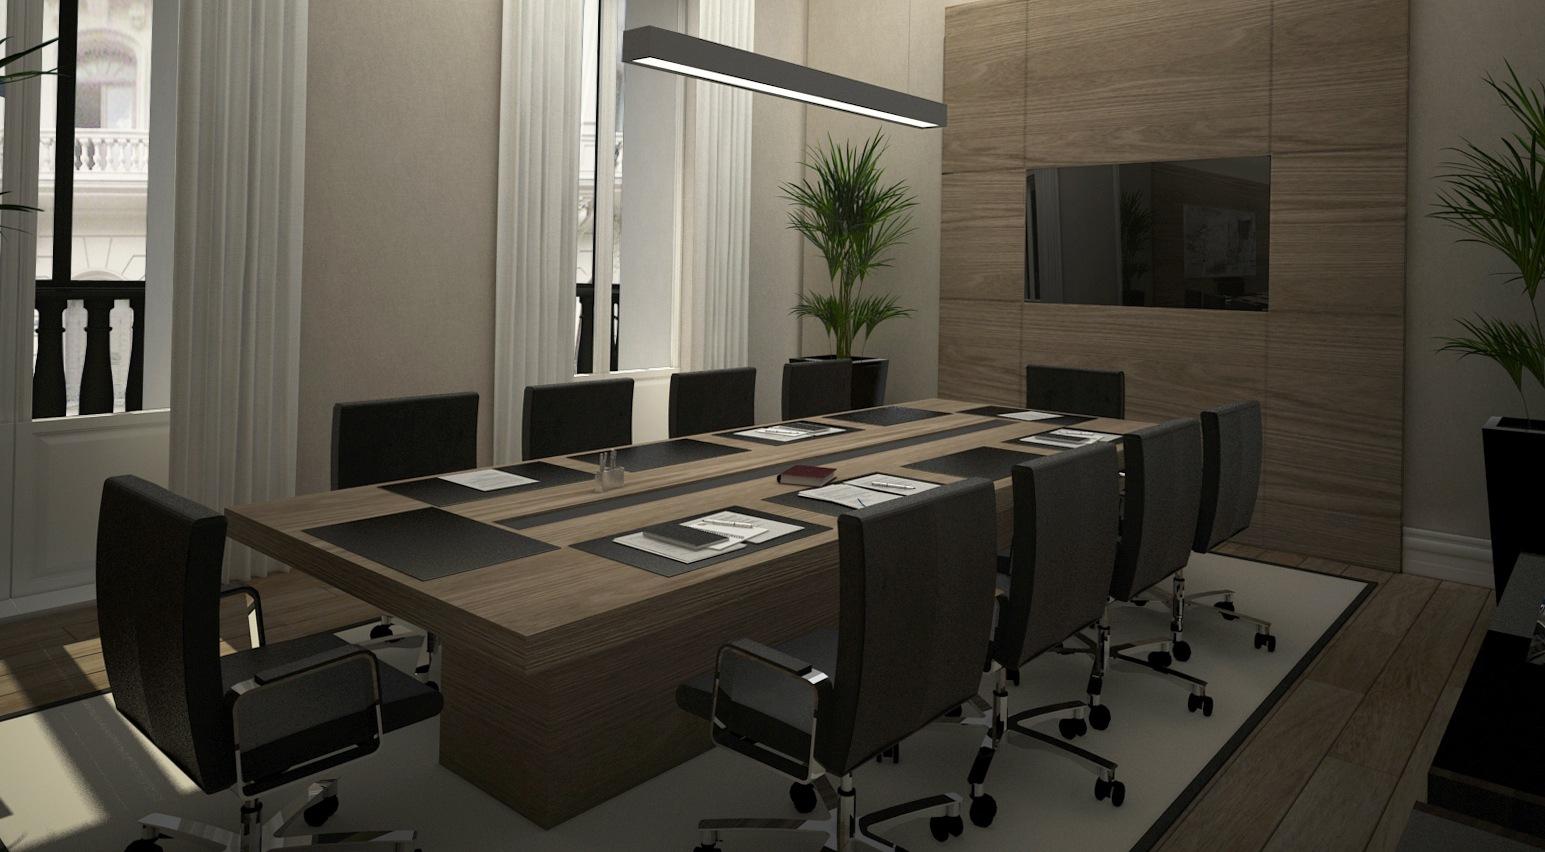 Sala de juntas inteligente